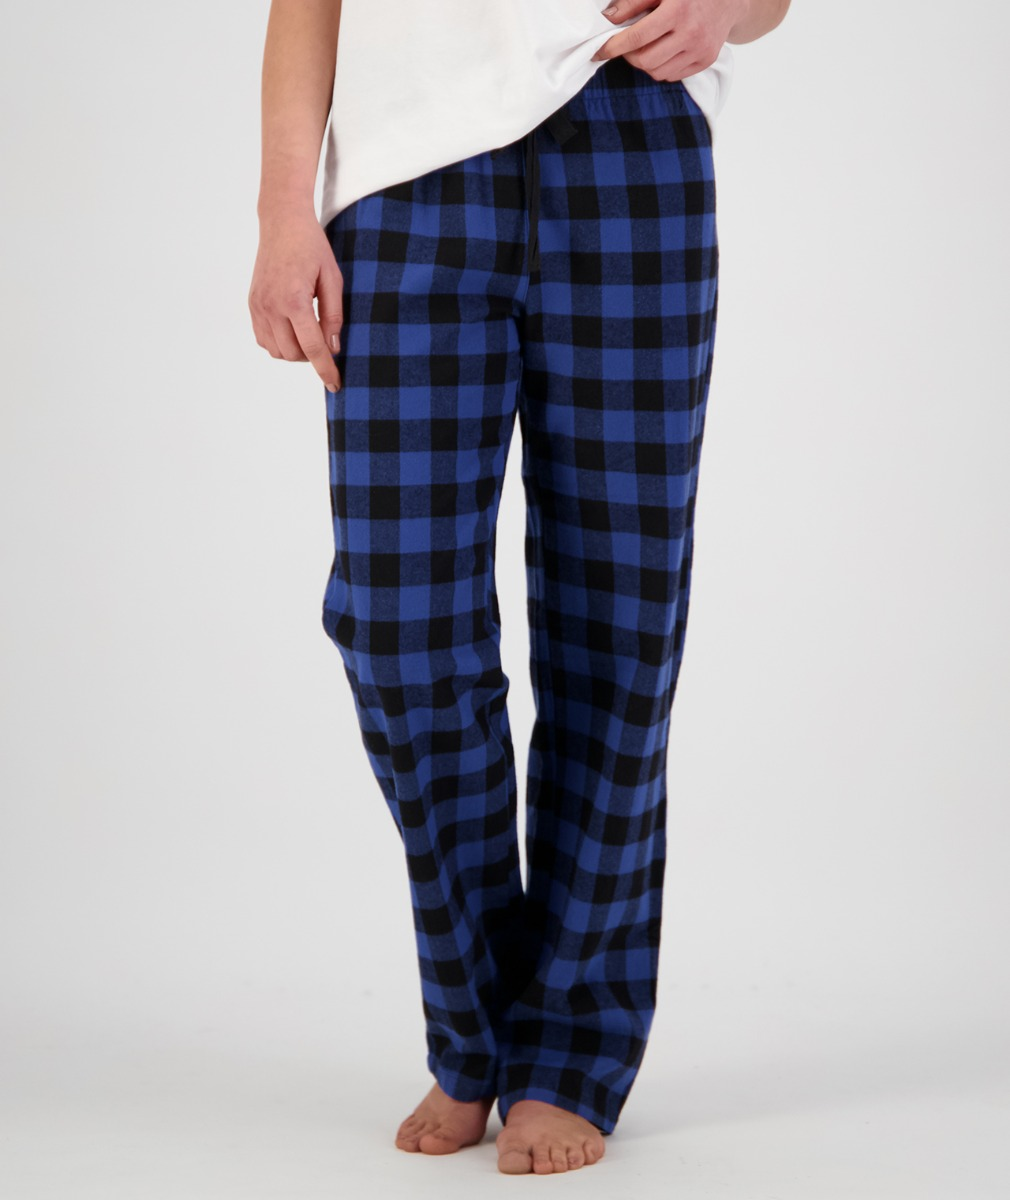 Swanndri Women's Cotton Eastend Sleep Pant in Blue/Black Check